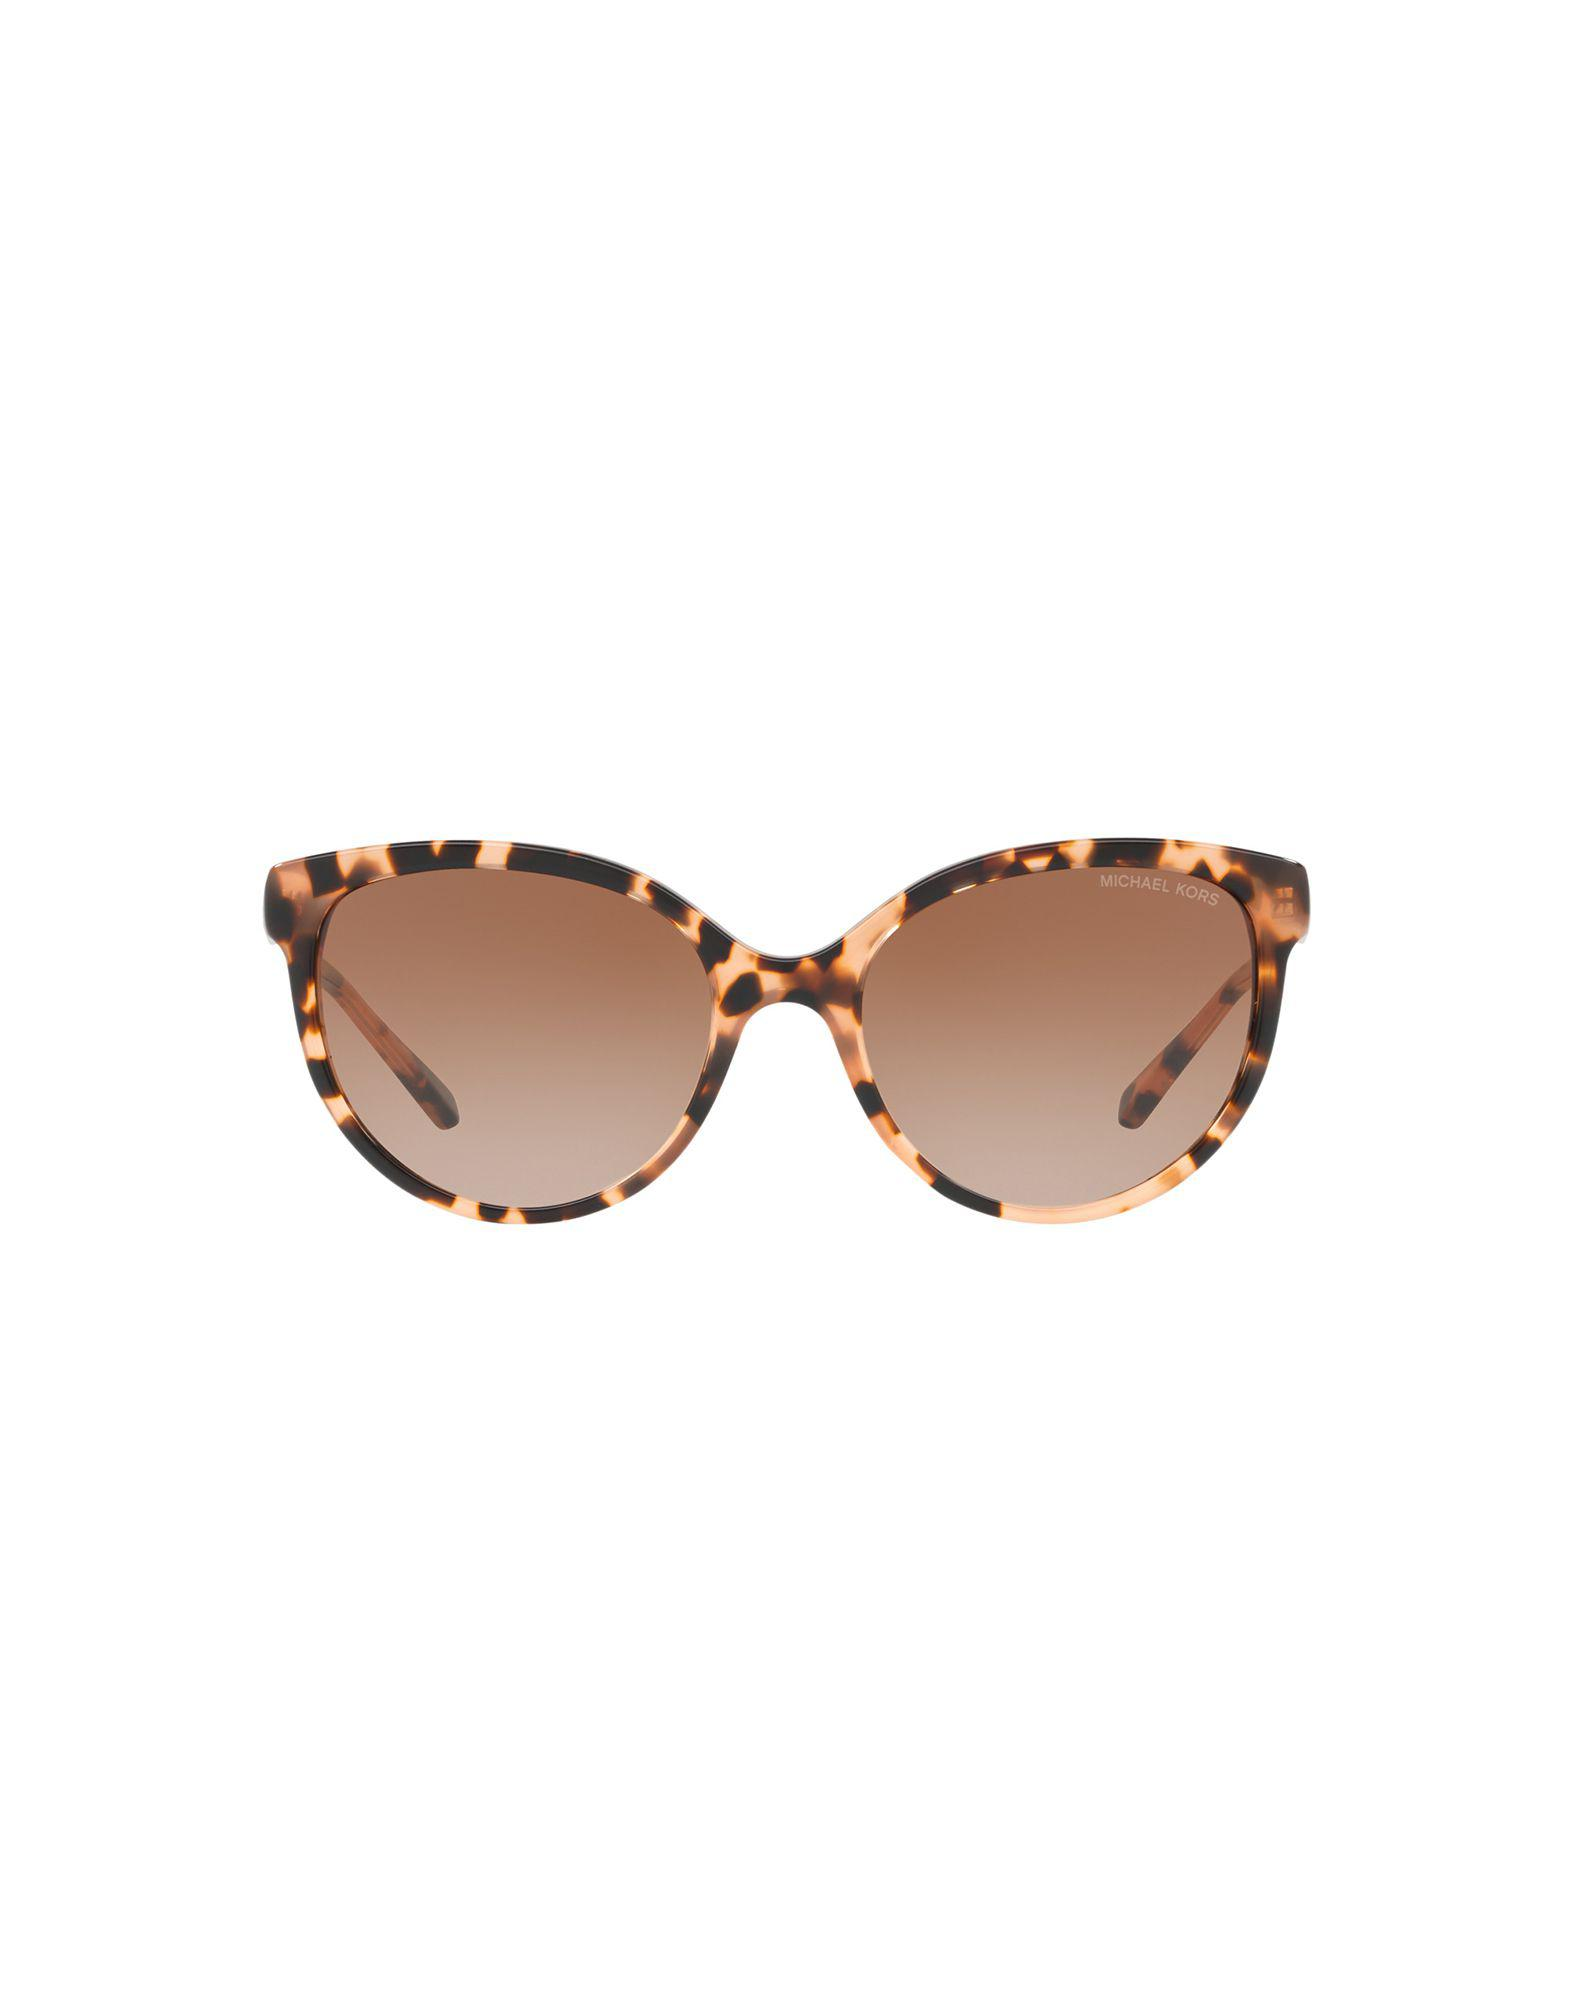 c8c8db7e02 Michael Kors Sunglasses in Brown - Lyst